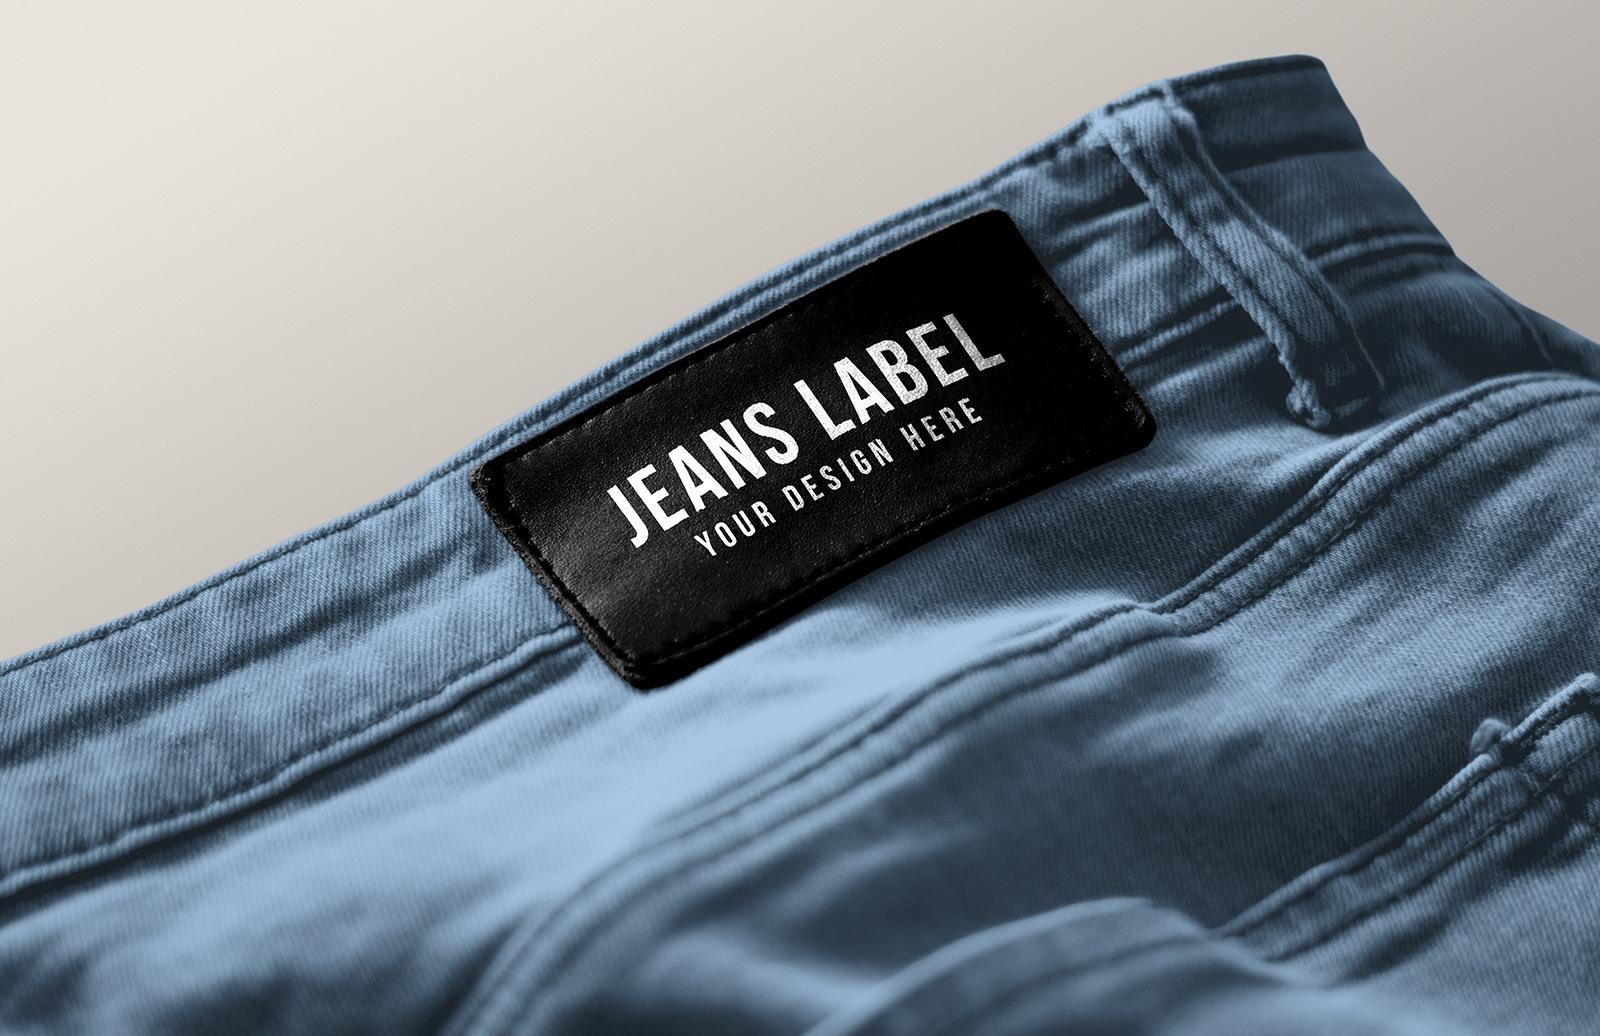 Jeans Label Branding Mockup Preview 1